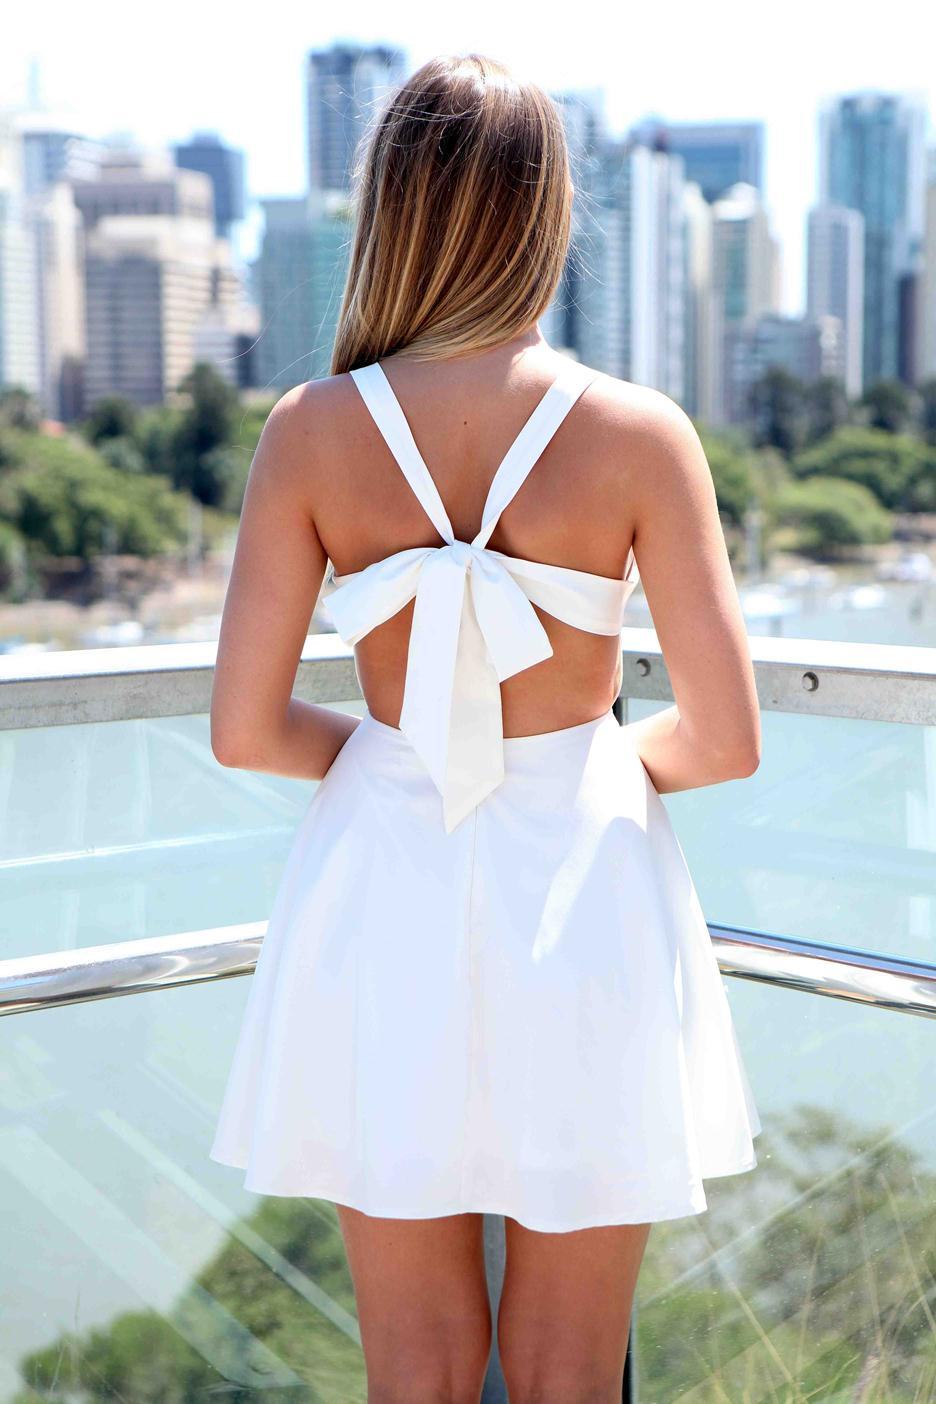 White criss cross dress photo album cleida